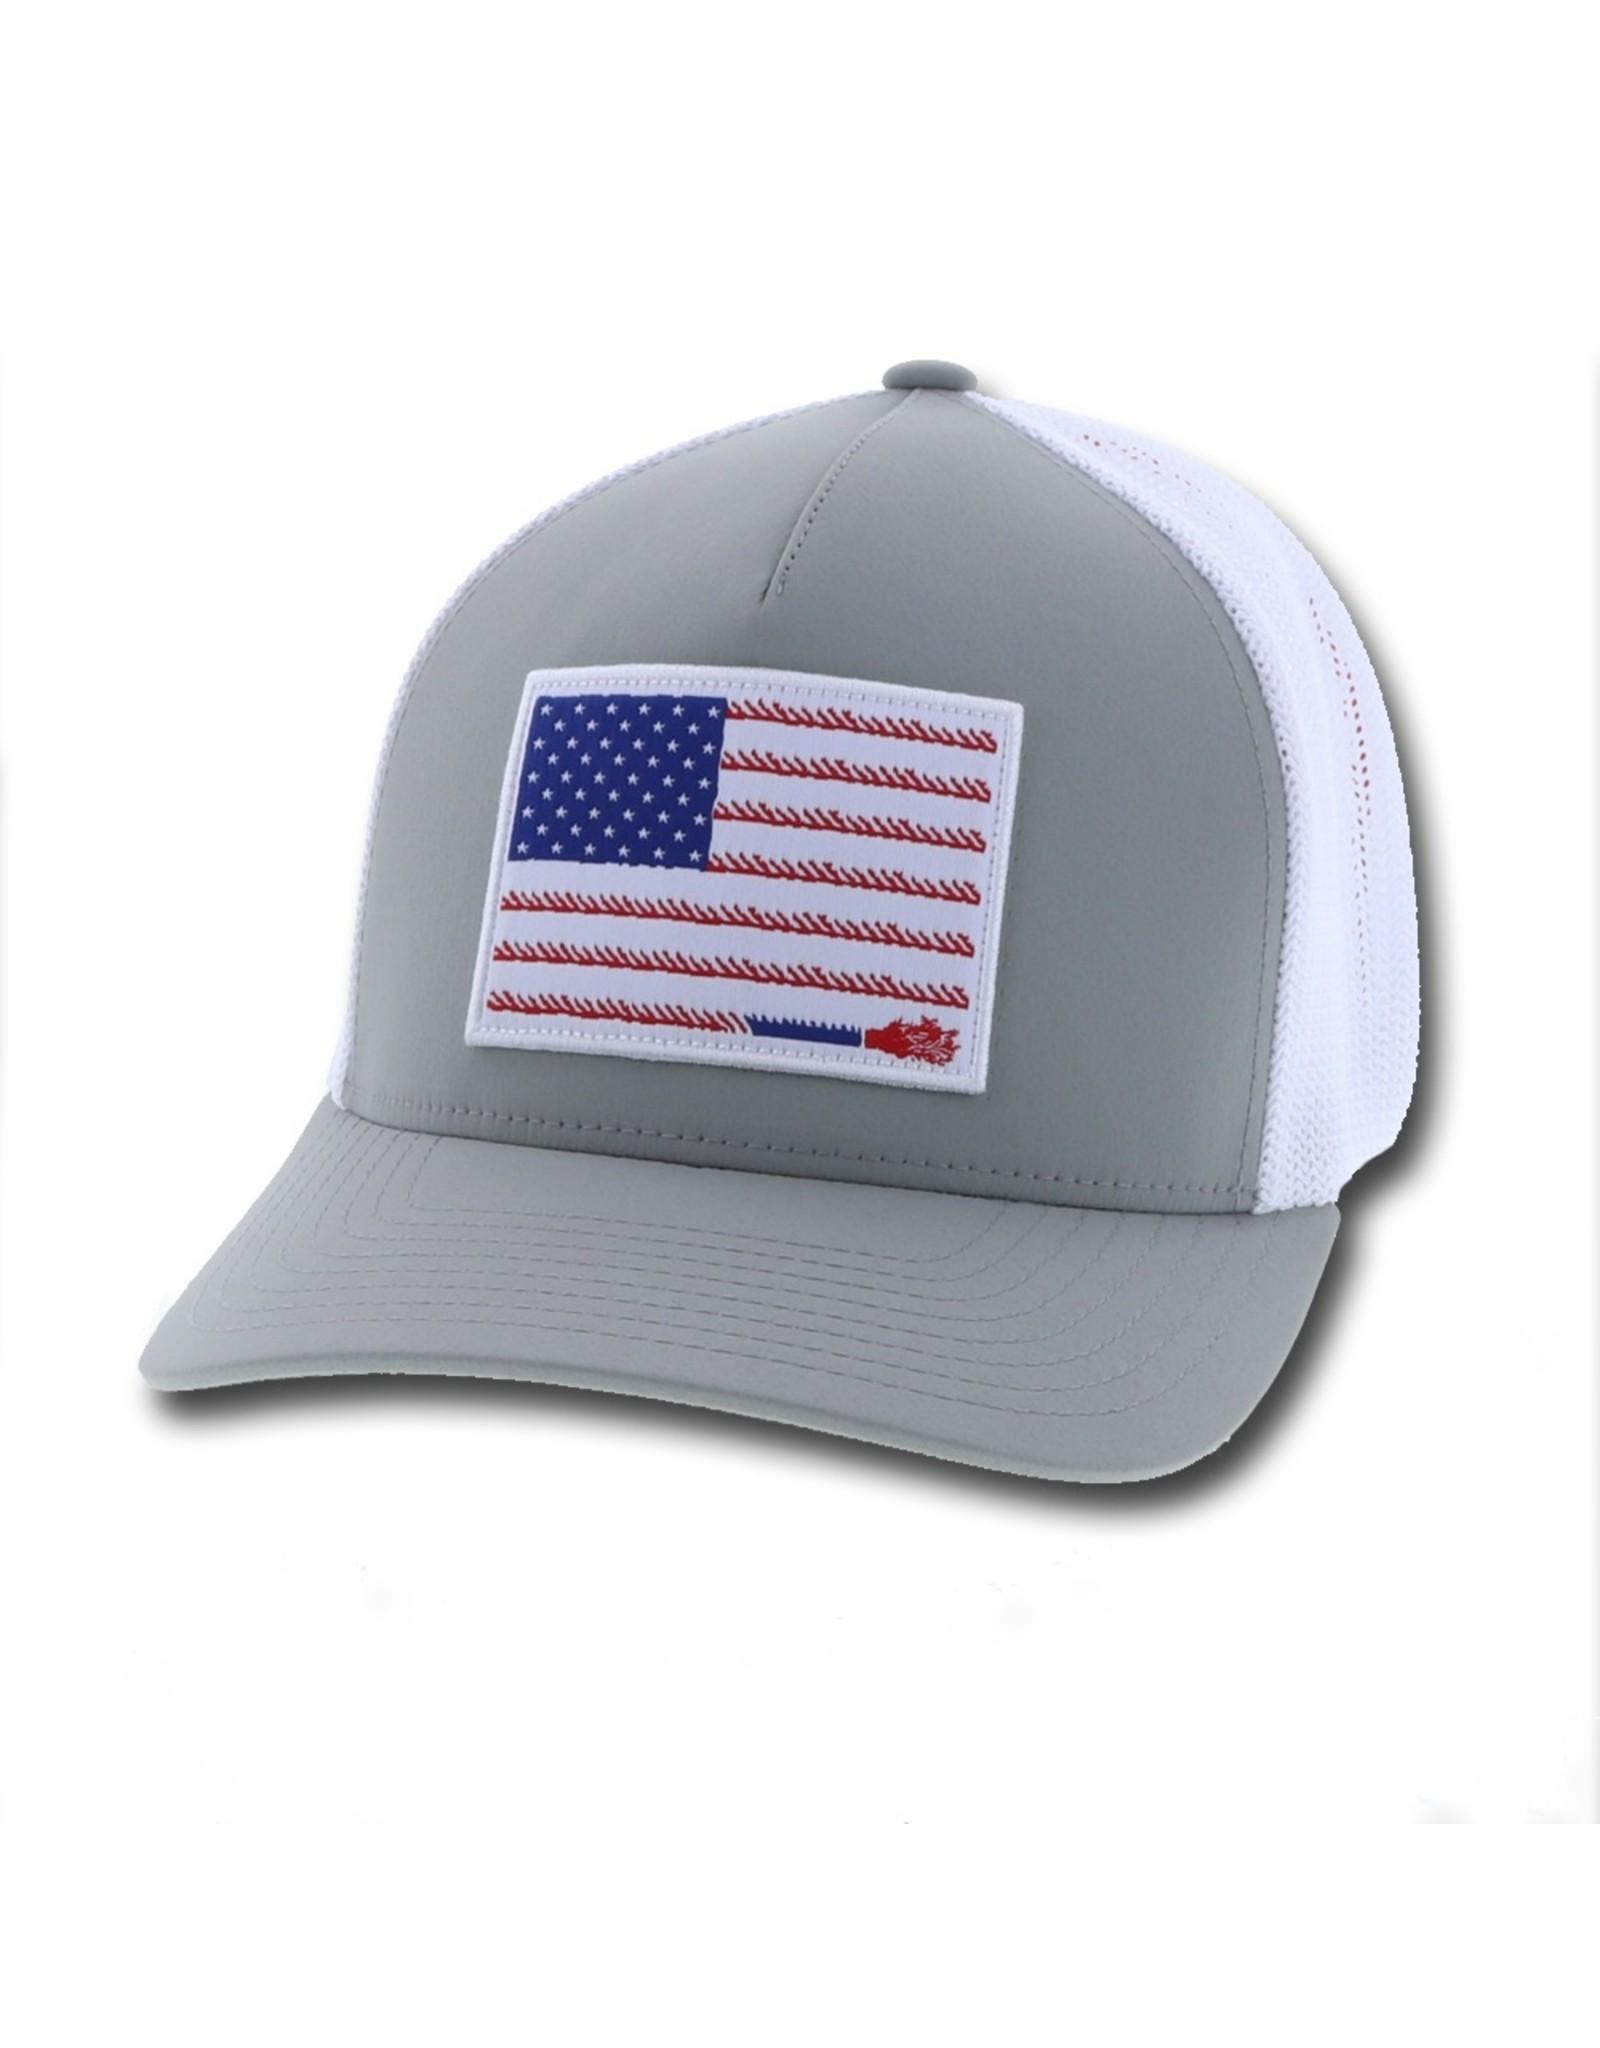 Hooey Hooey Liberty Roper FlexFit Cap